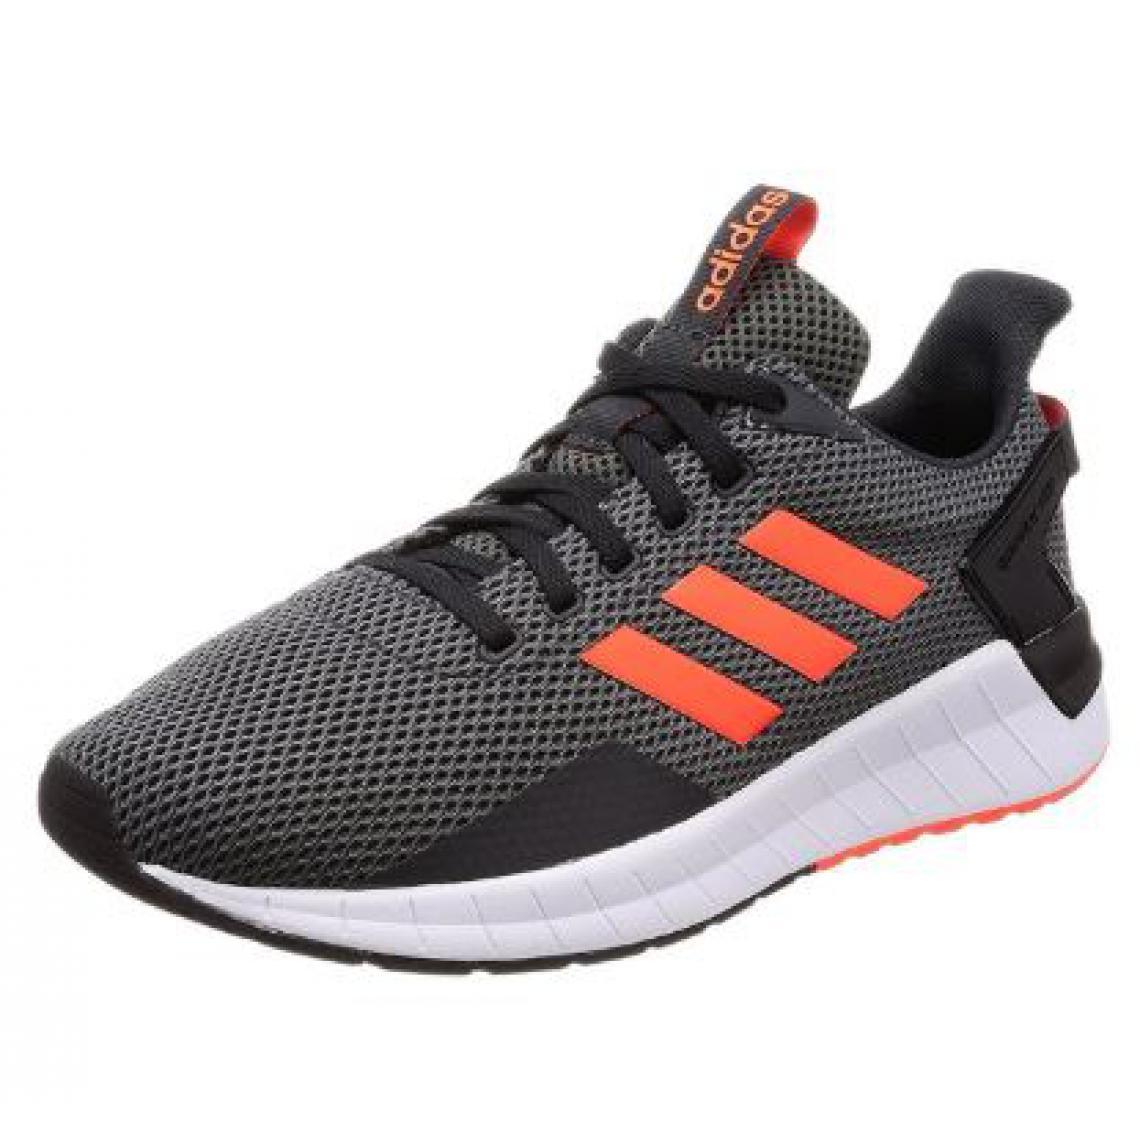 Chaussures De Running Questar Ride Adidas Homme gvy67Ybf